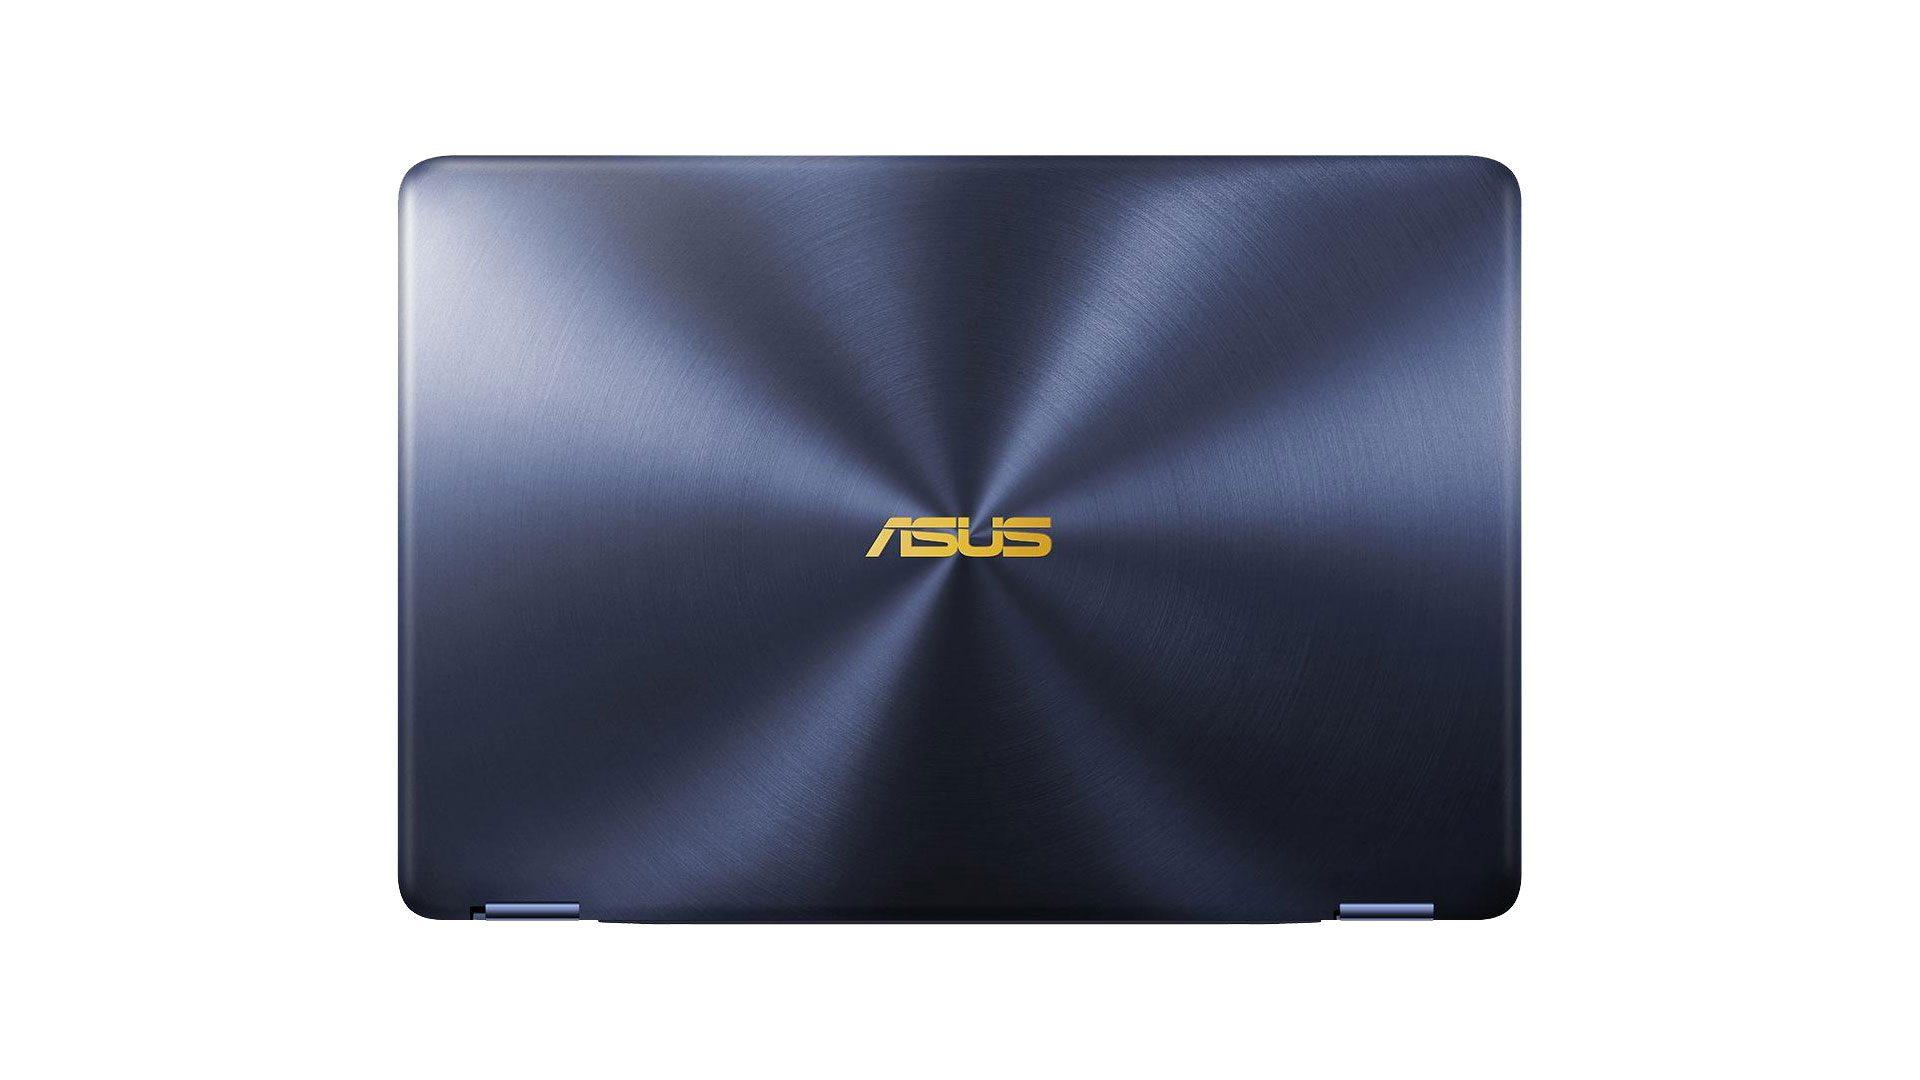 Asus-Zenbook-Flip-S-UX370_Ansicht-7